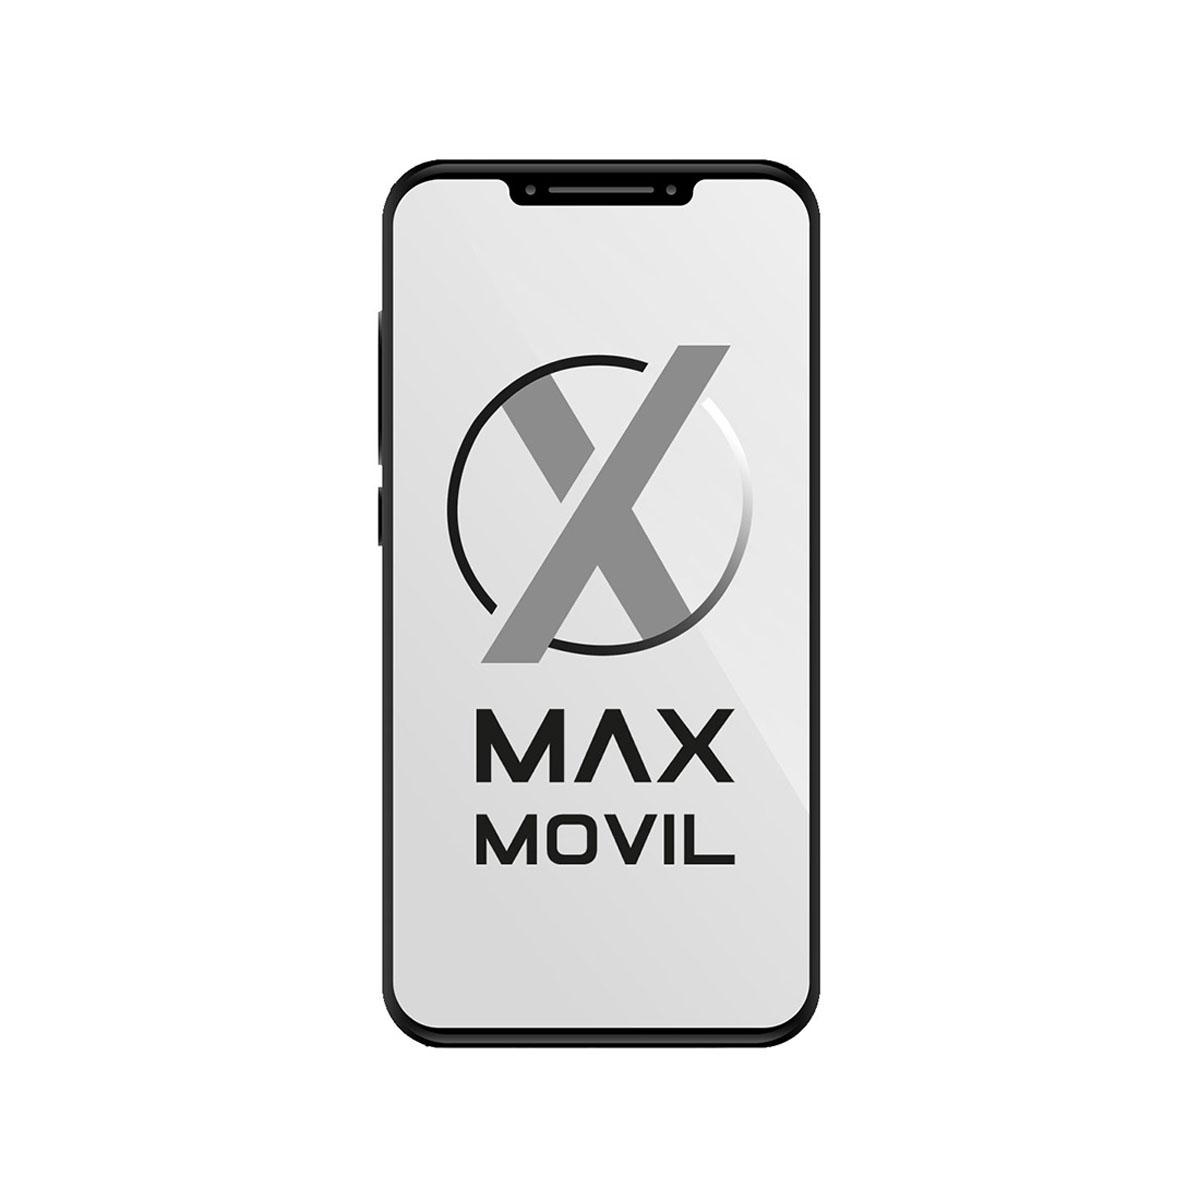 Apple iPhone 6 Silver 16GB libre